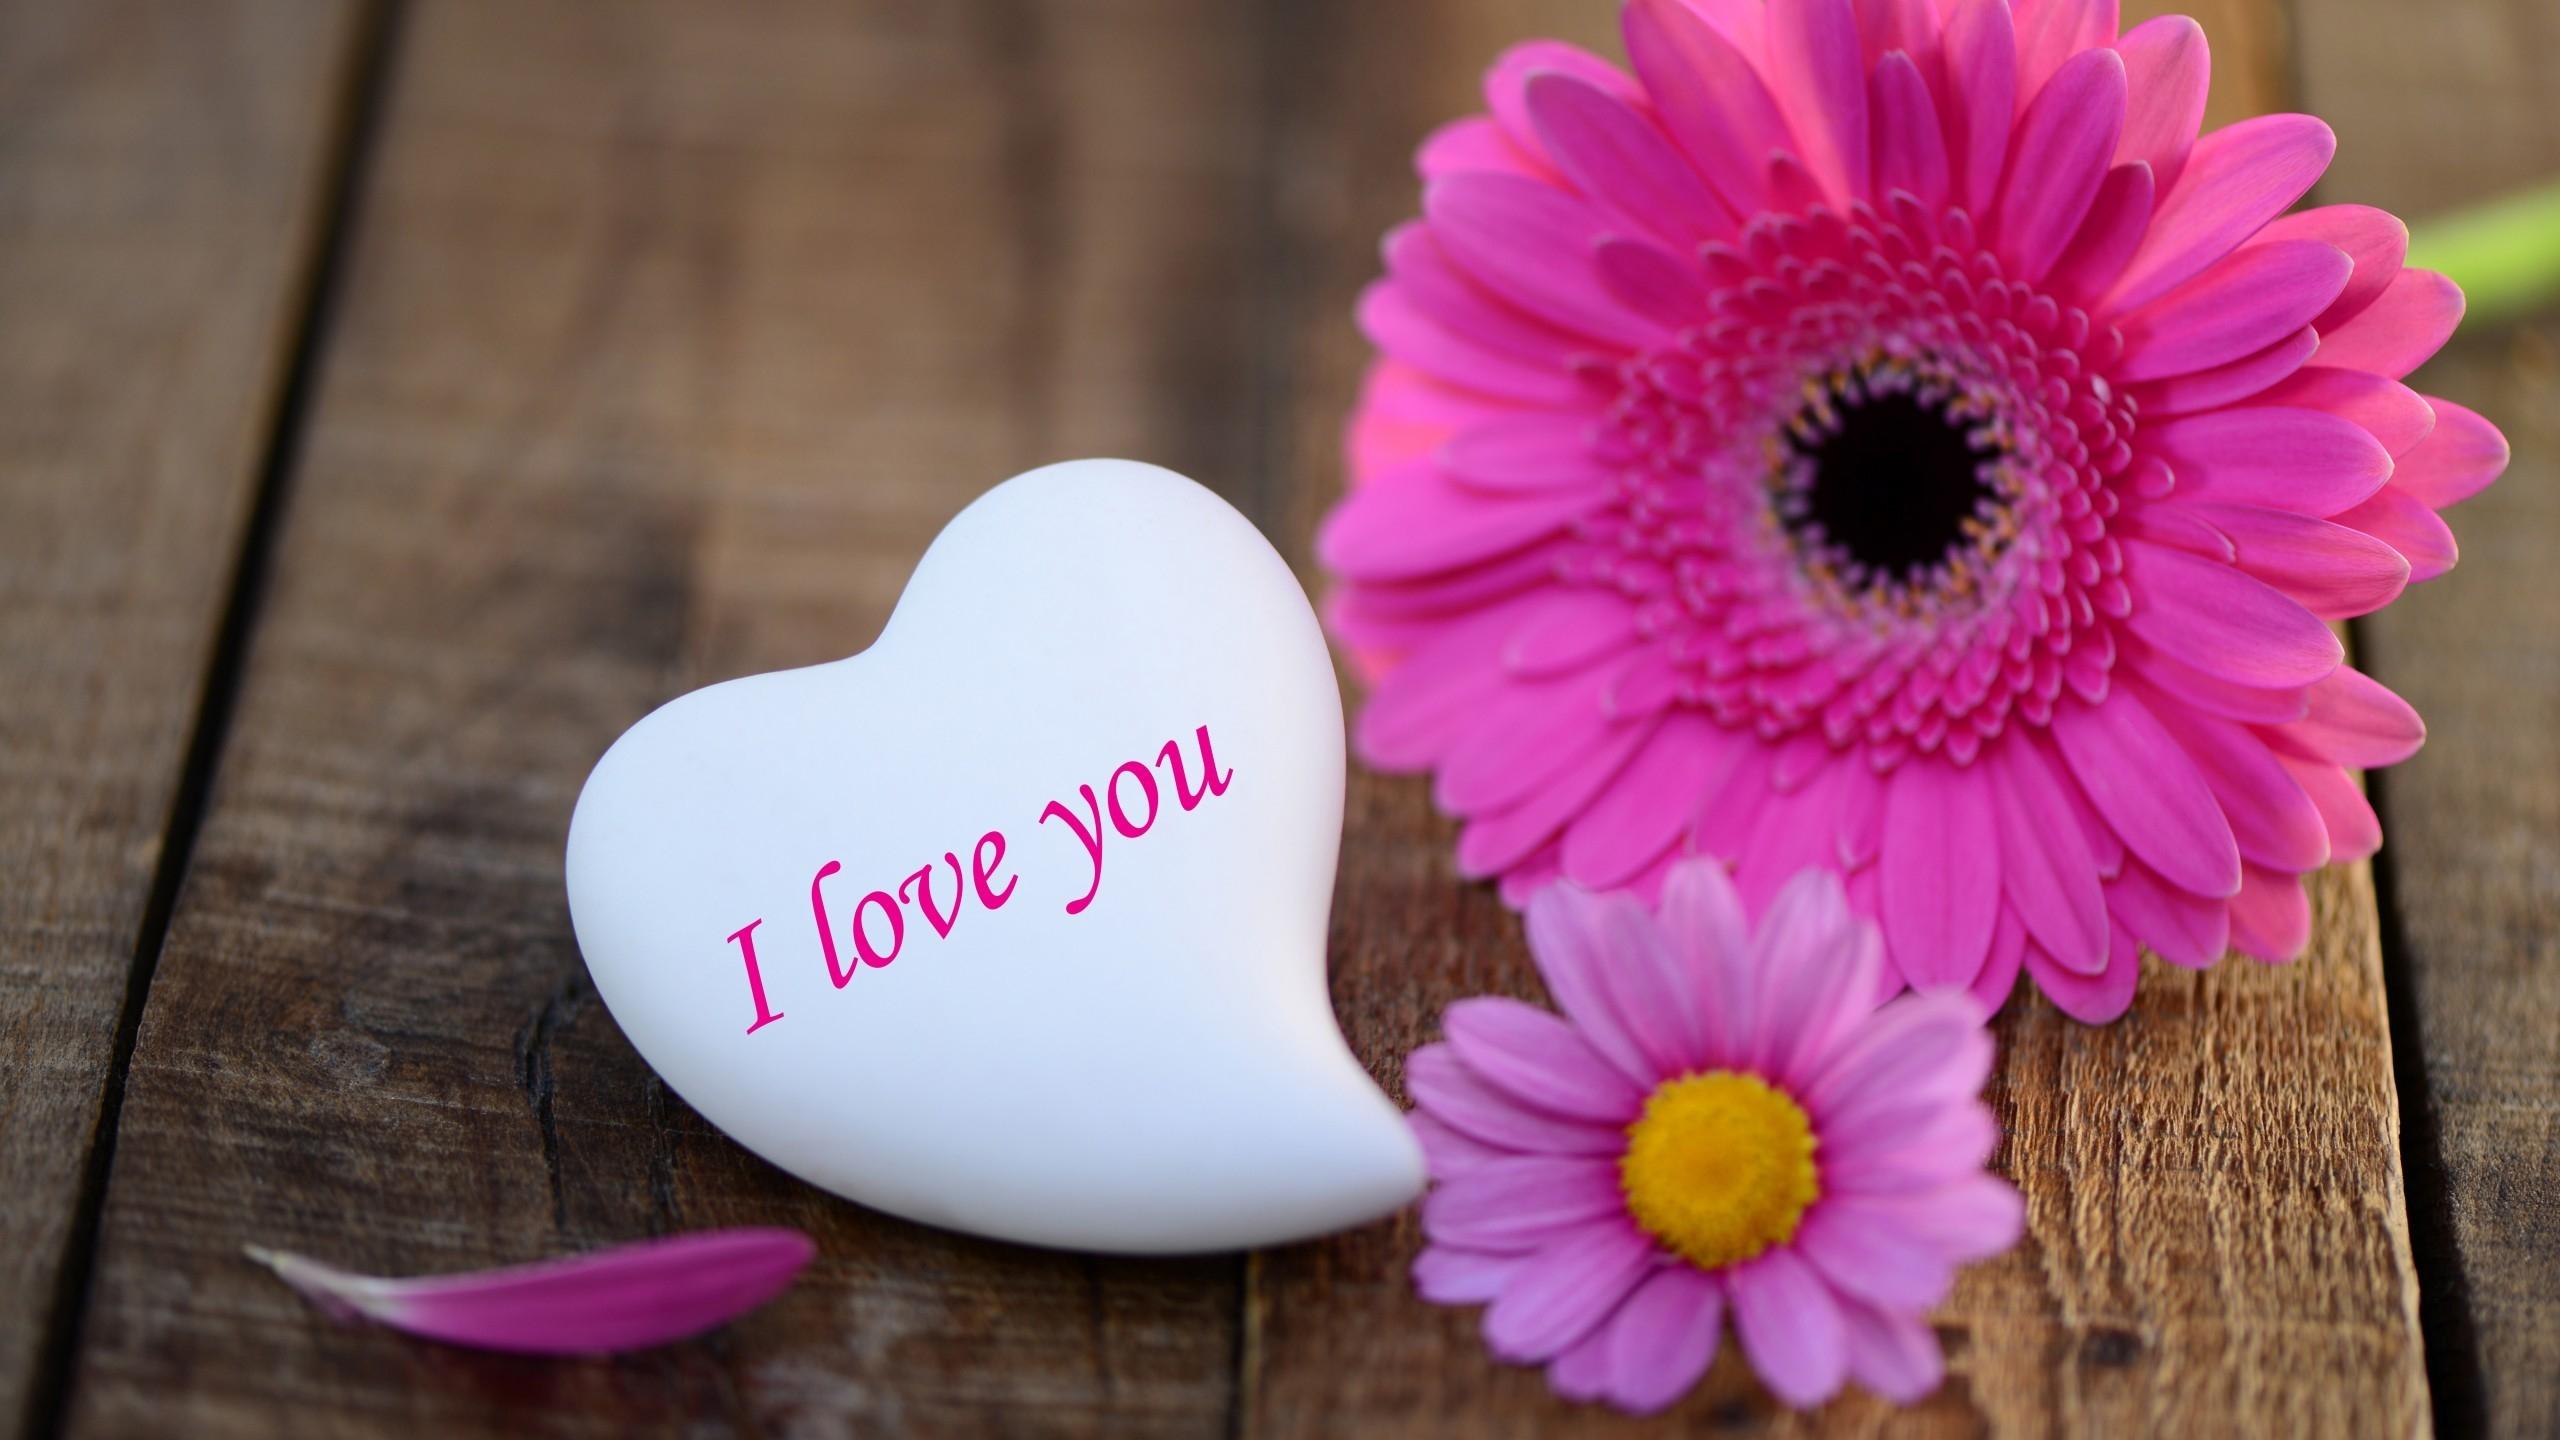 Beautiful love flowers photos the best flowers ideas 2560x1440 izmirmasajfo